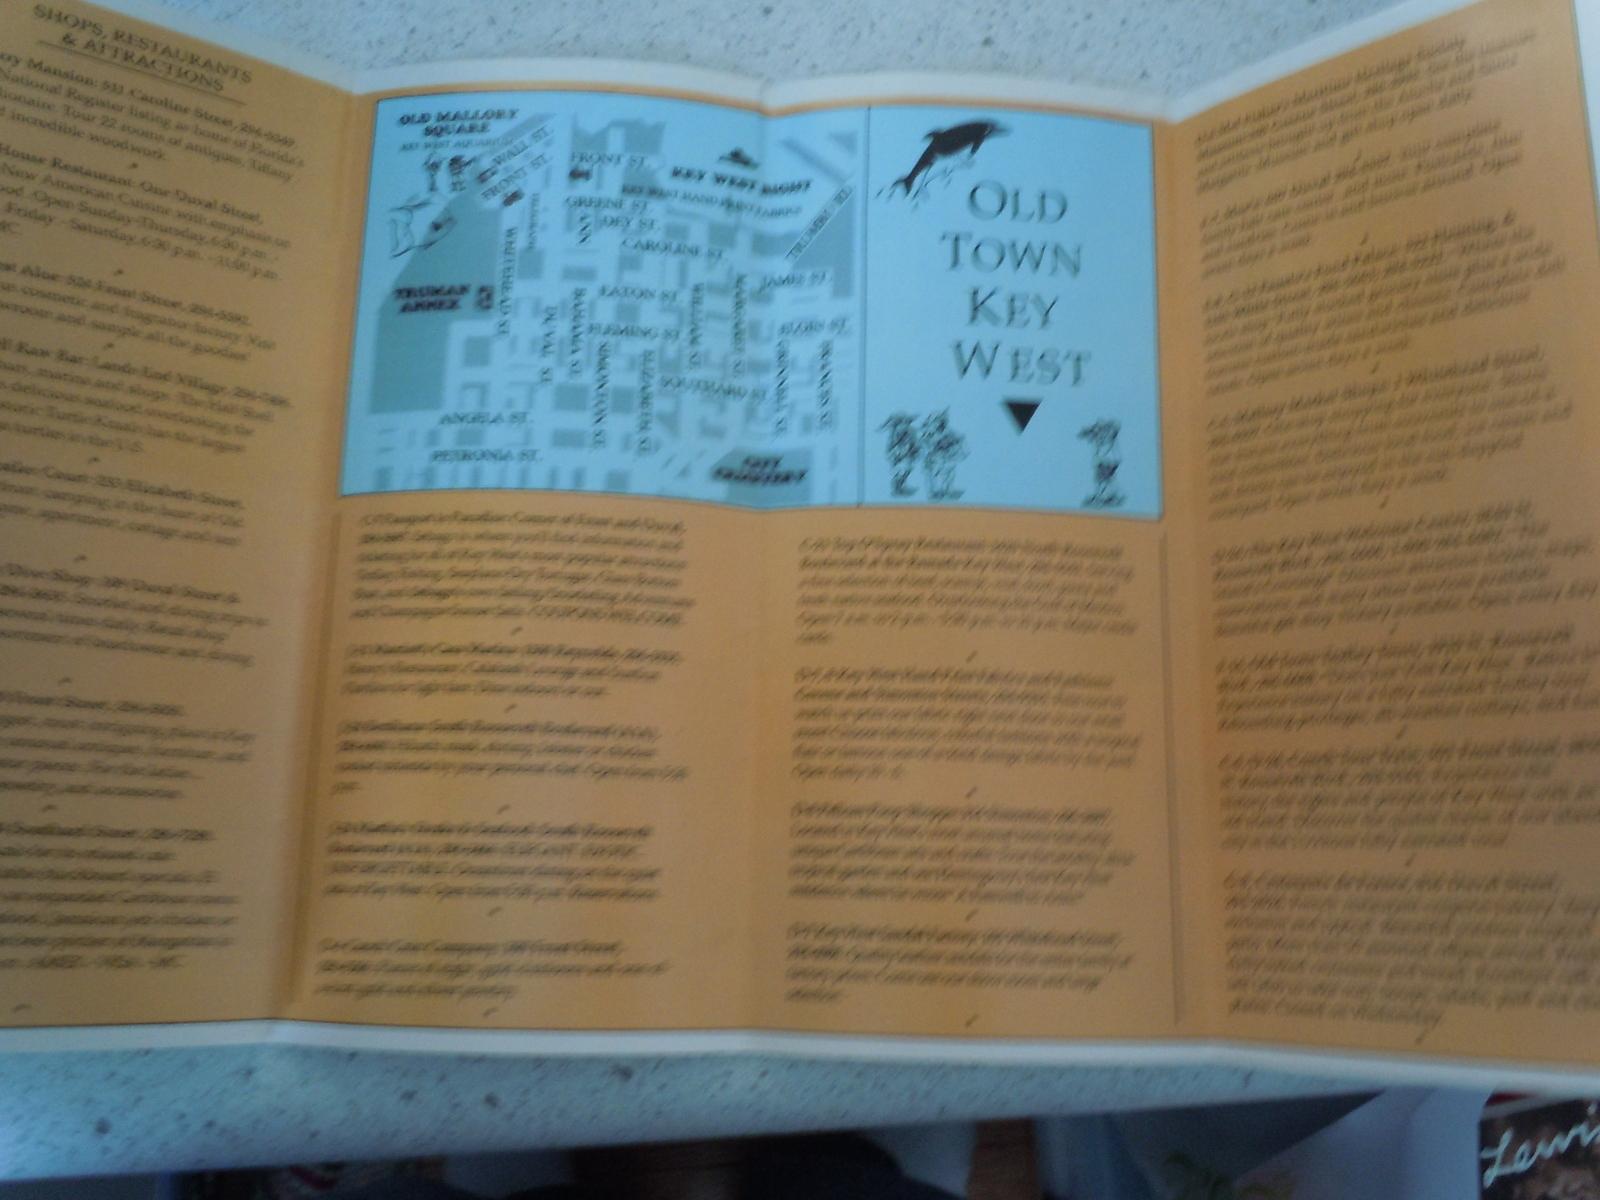 See The Best of Key West Brochure 1990